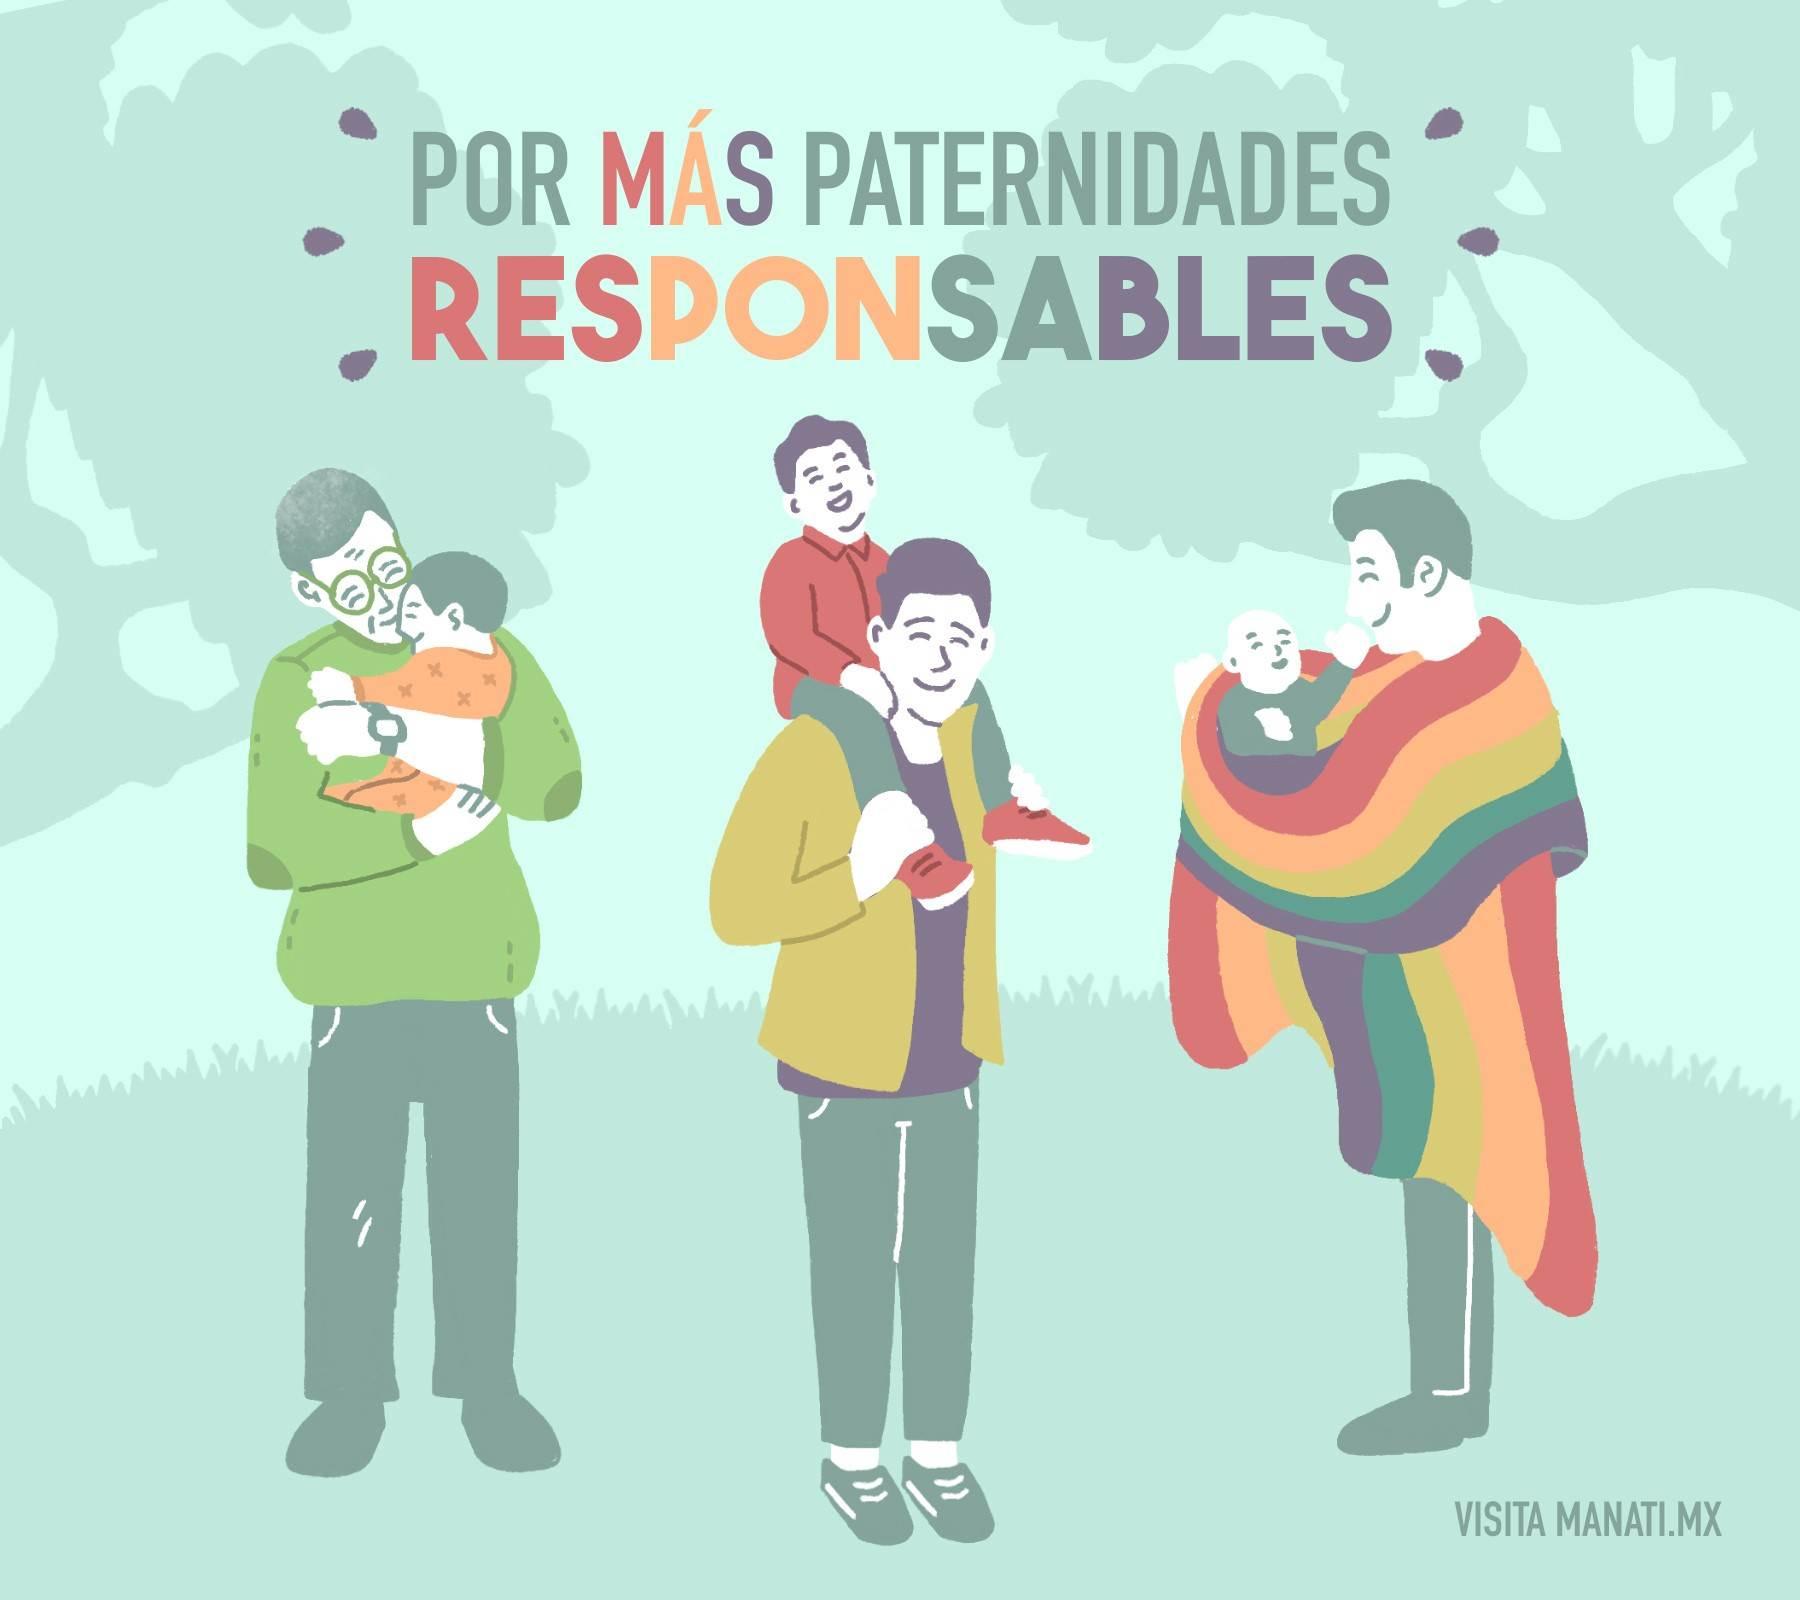 Día del padre paternidades responsables